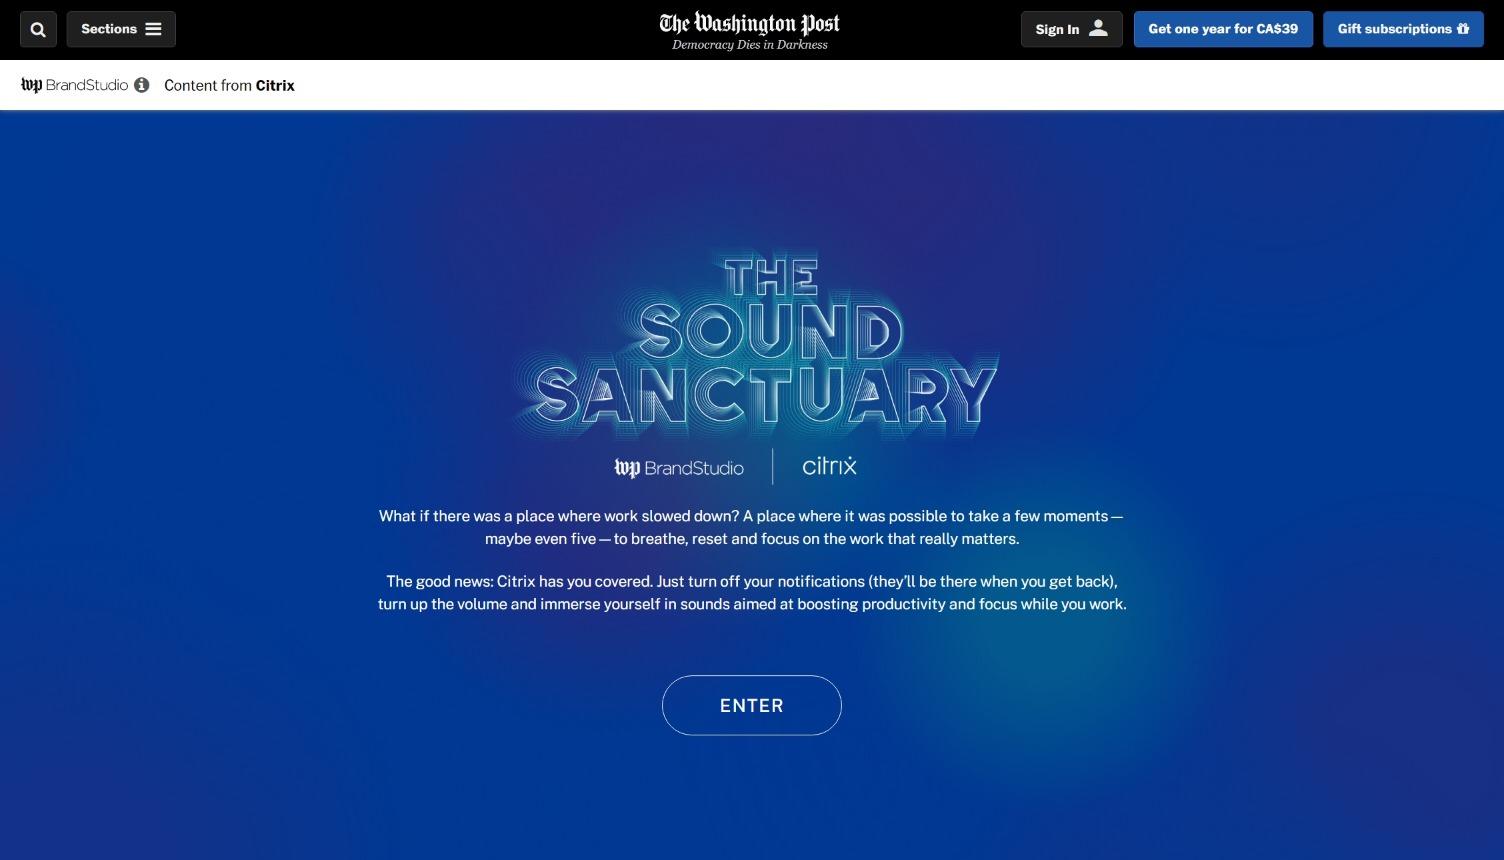 The Washington Post and Citrix The Sound Sanctuary